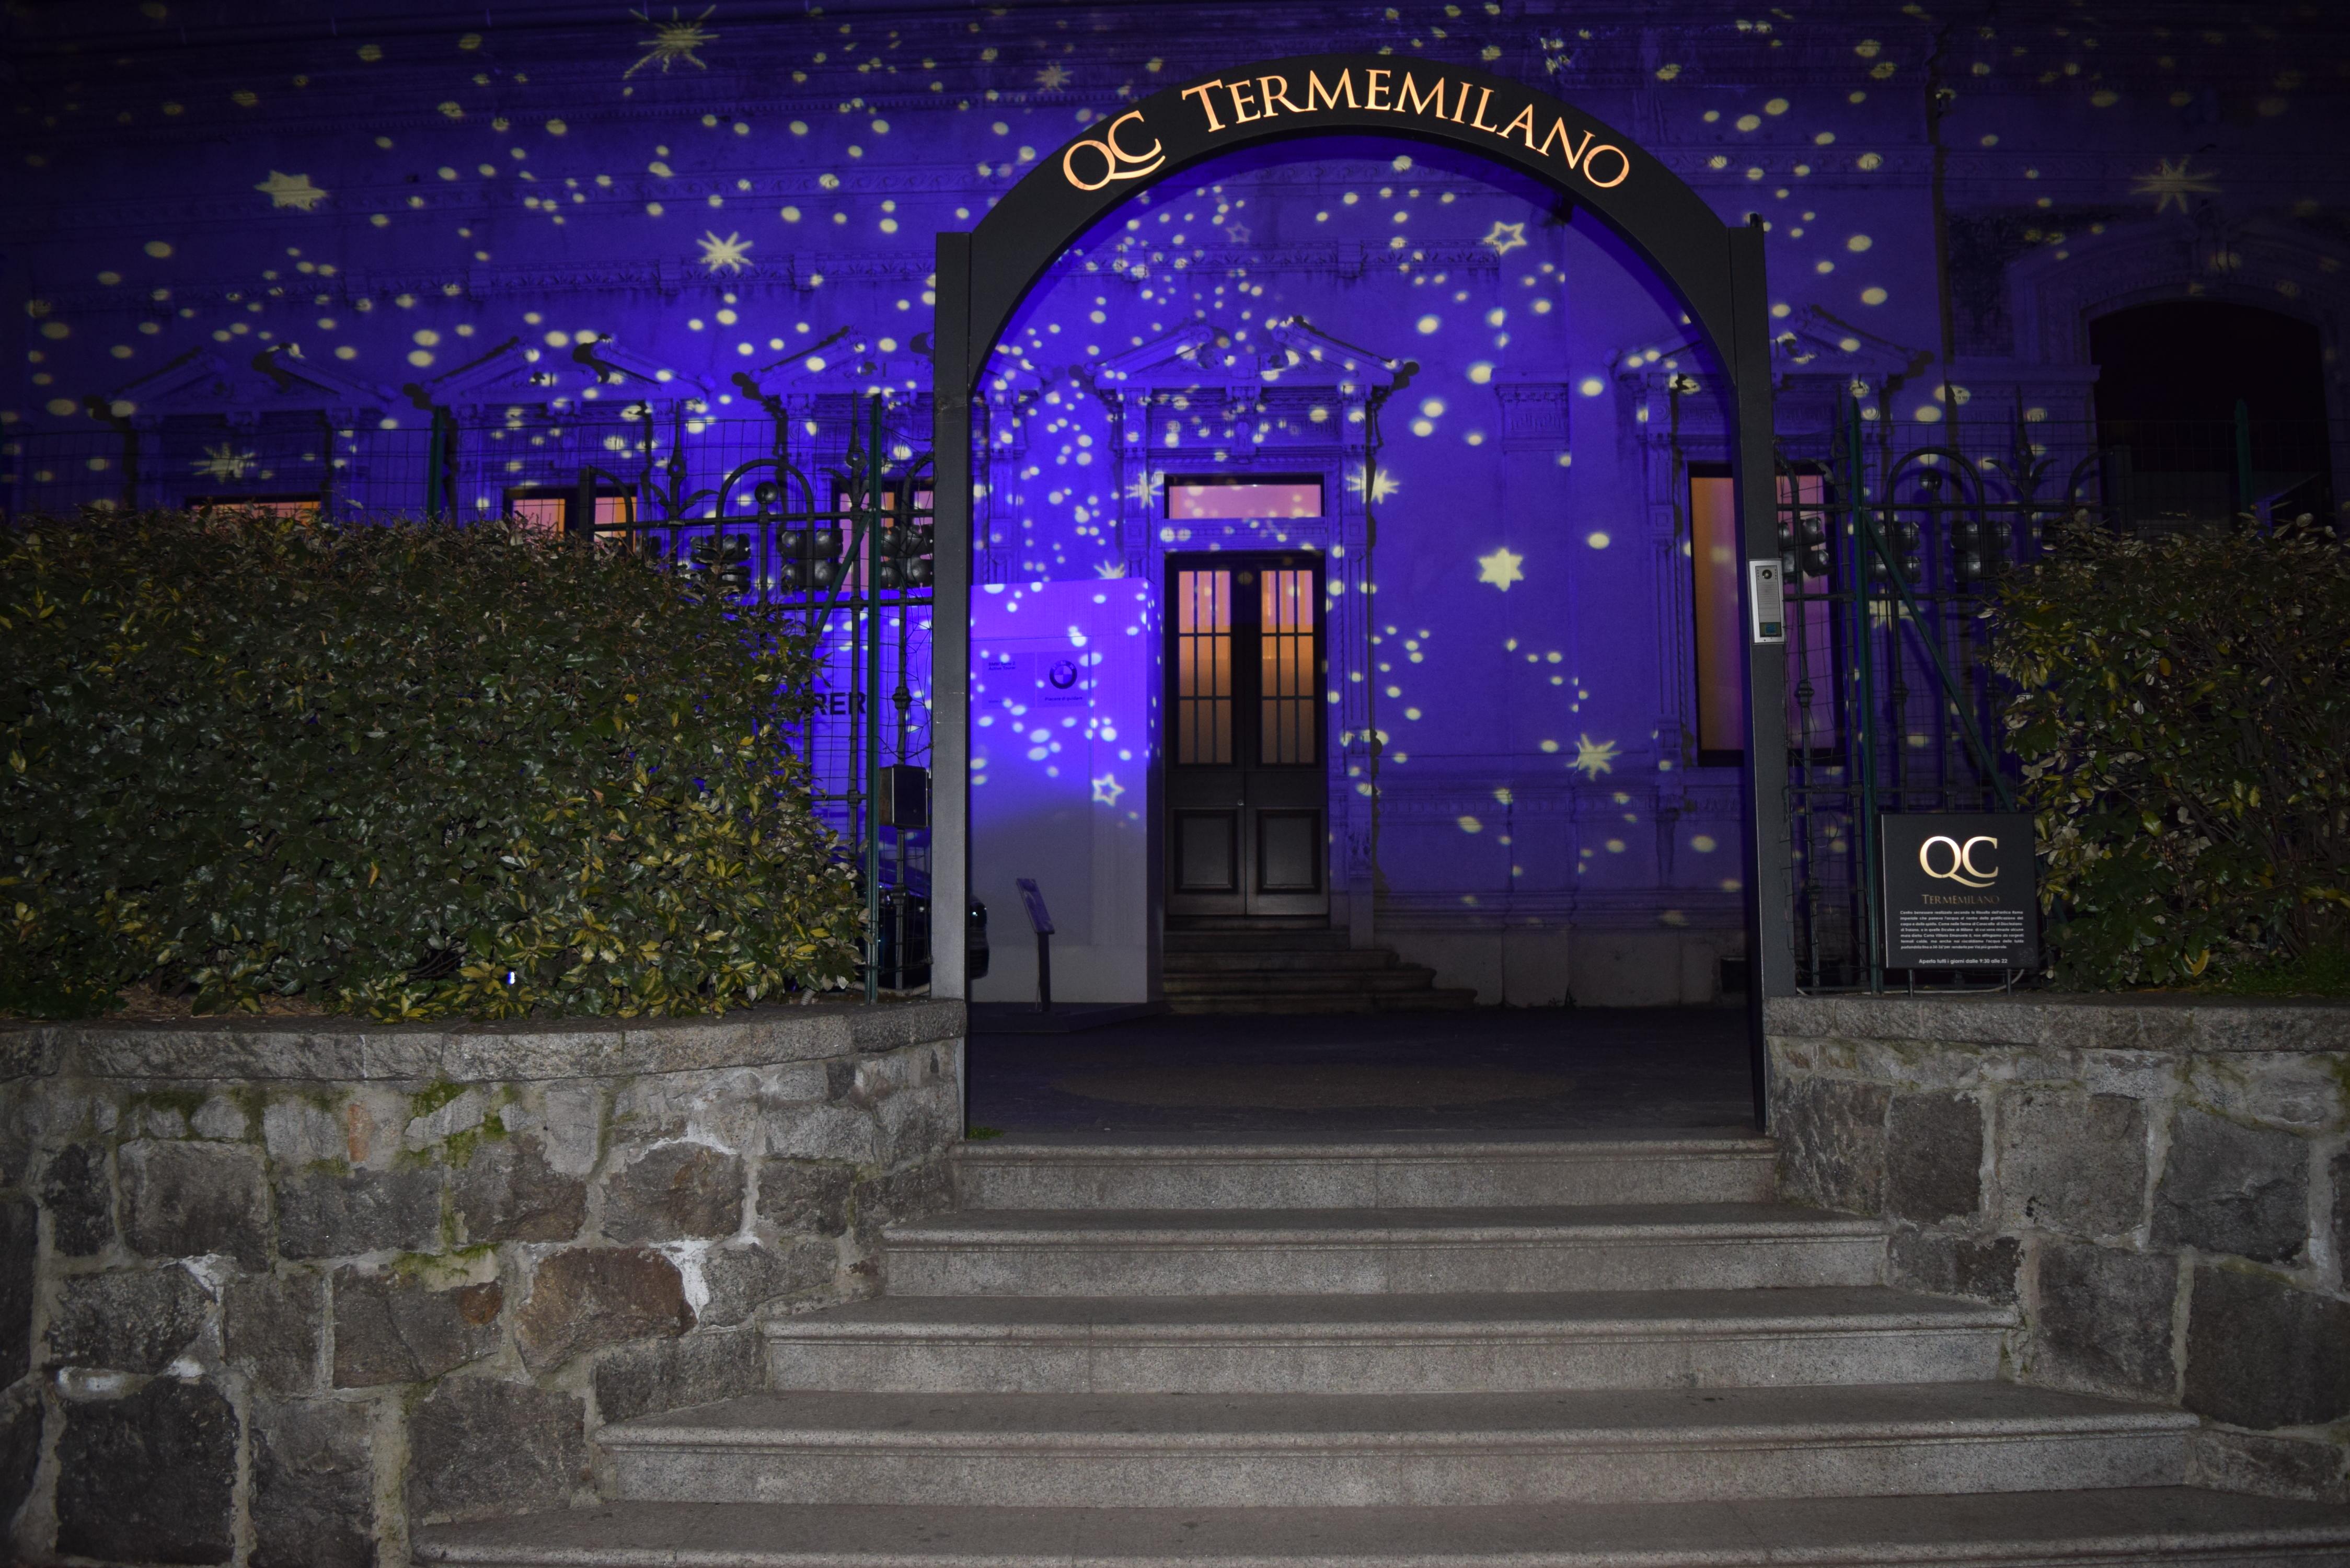 Porta romana passipermilano - Terme porta romana ...